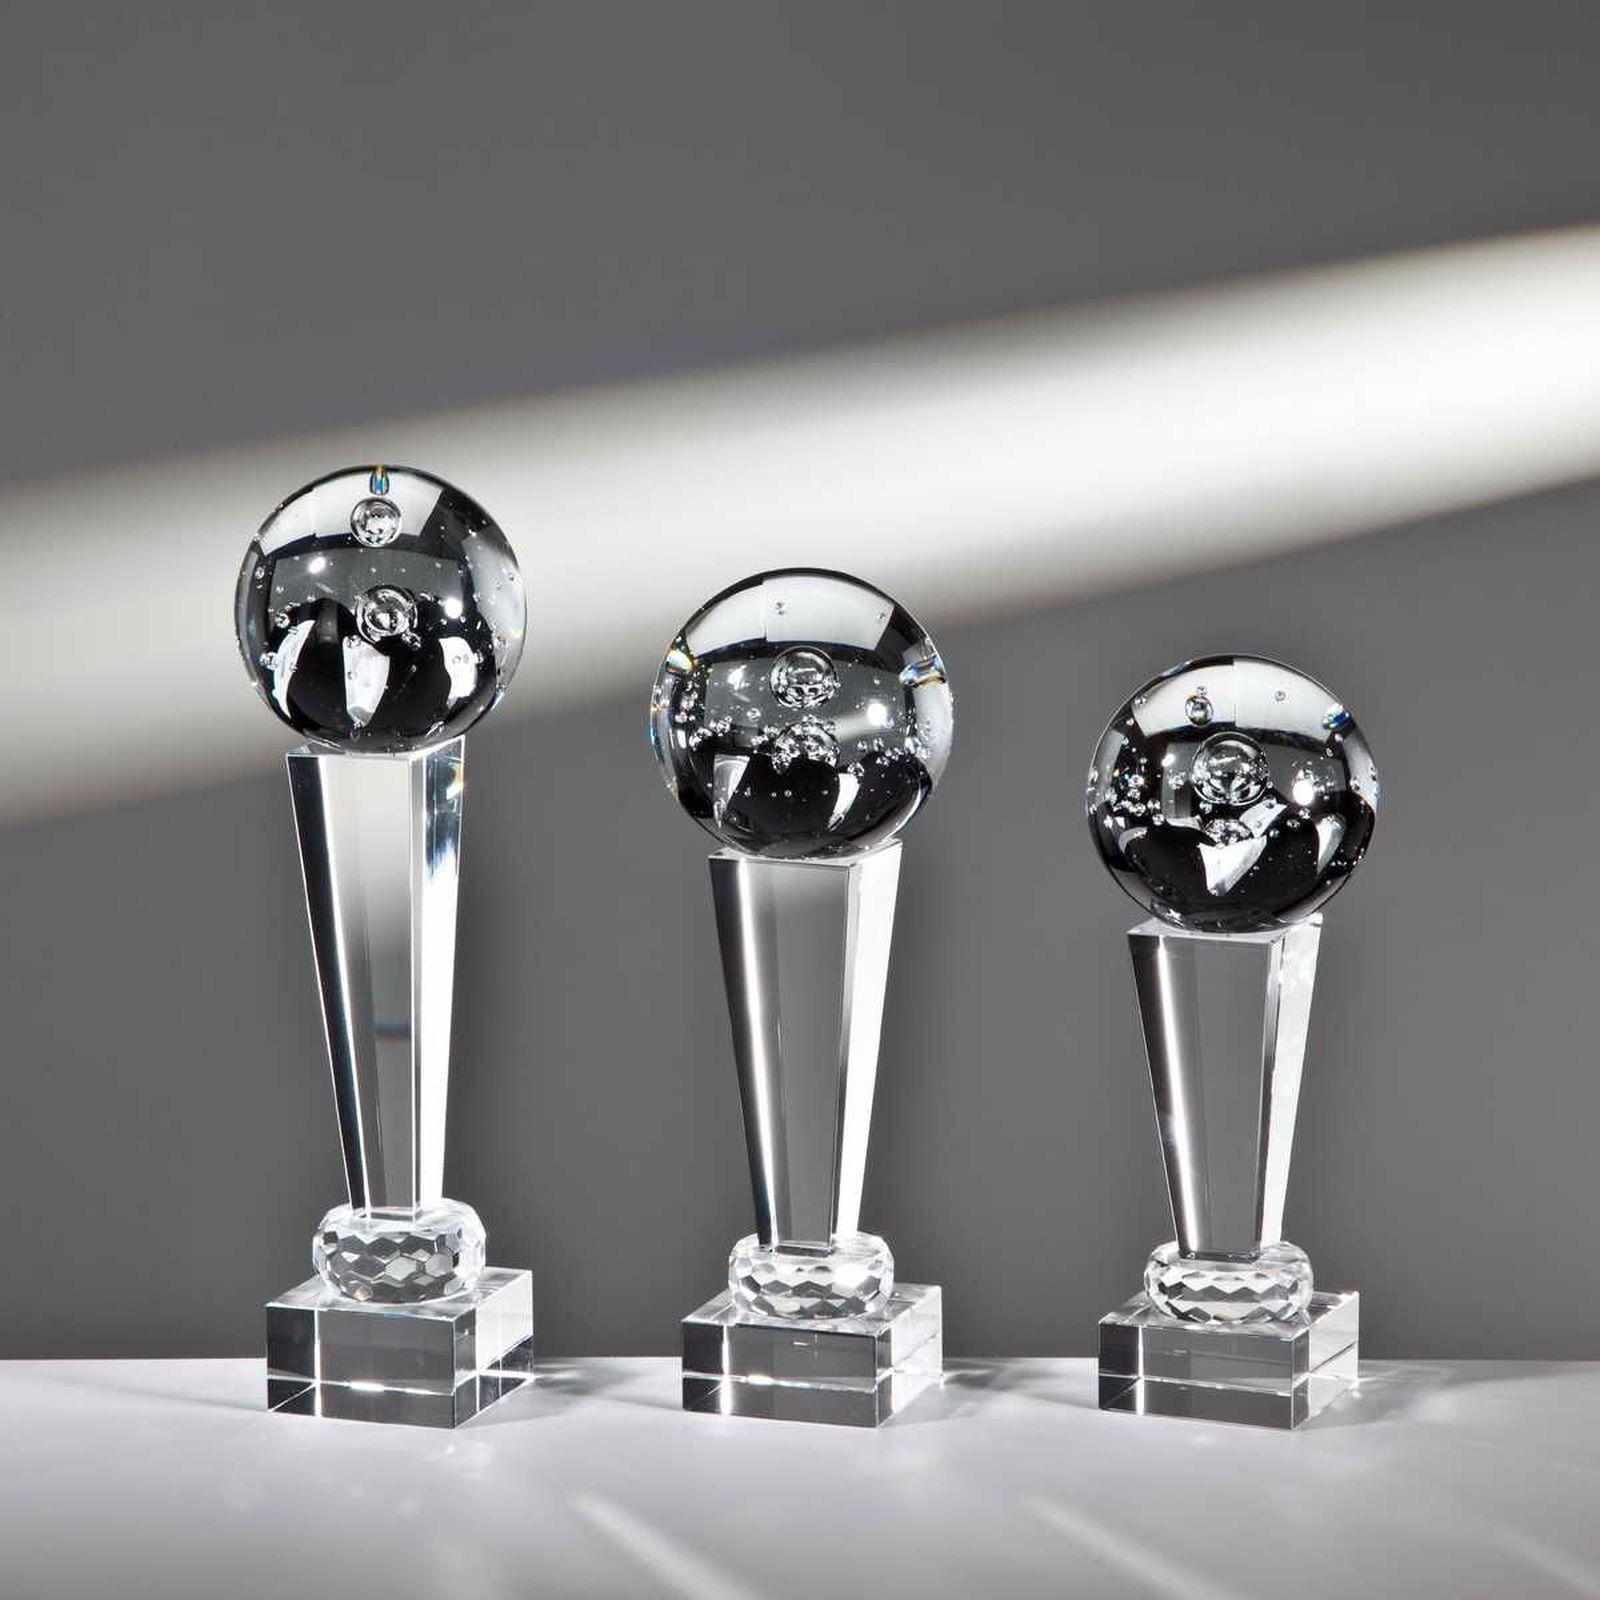 1 Noblesseglas Glaspokal 23cm Kristall mit Gravur  128 (Wander-Pokal Jubiläum)